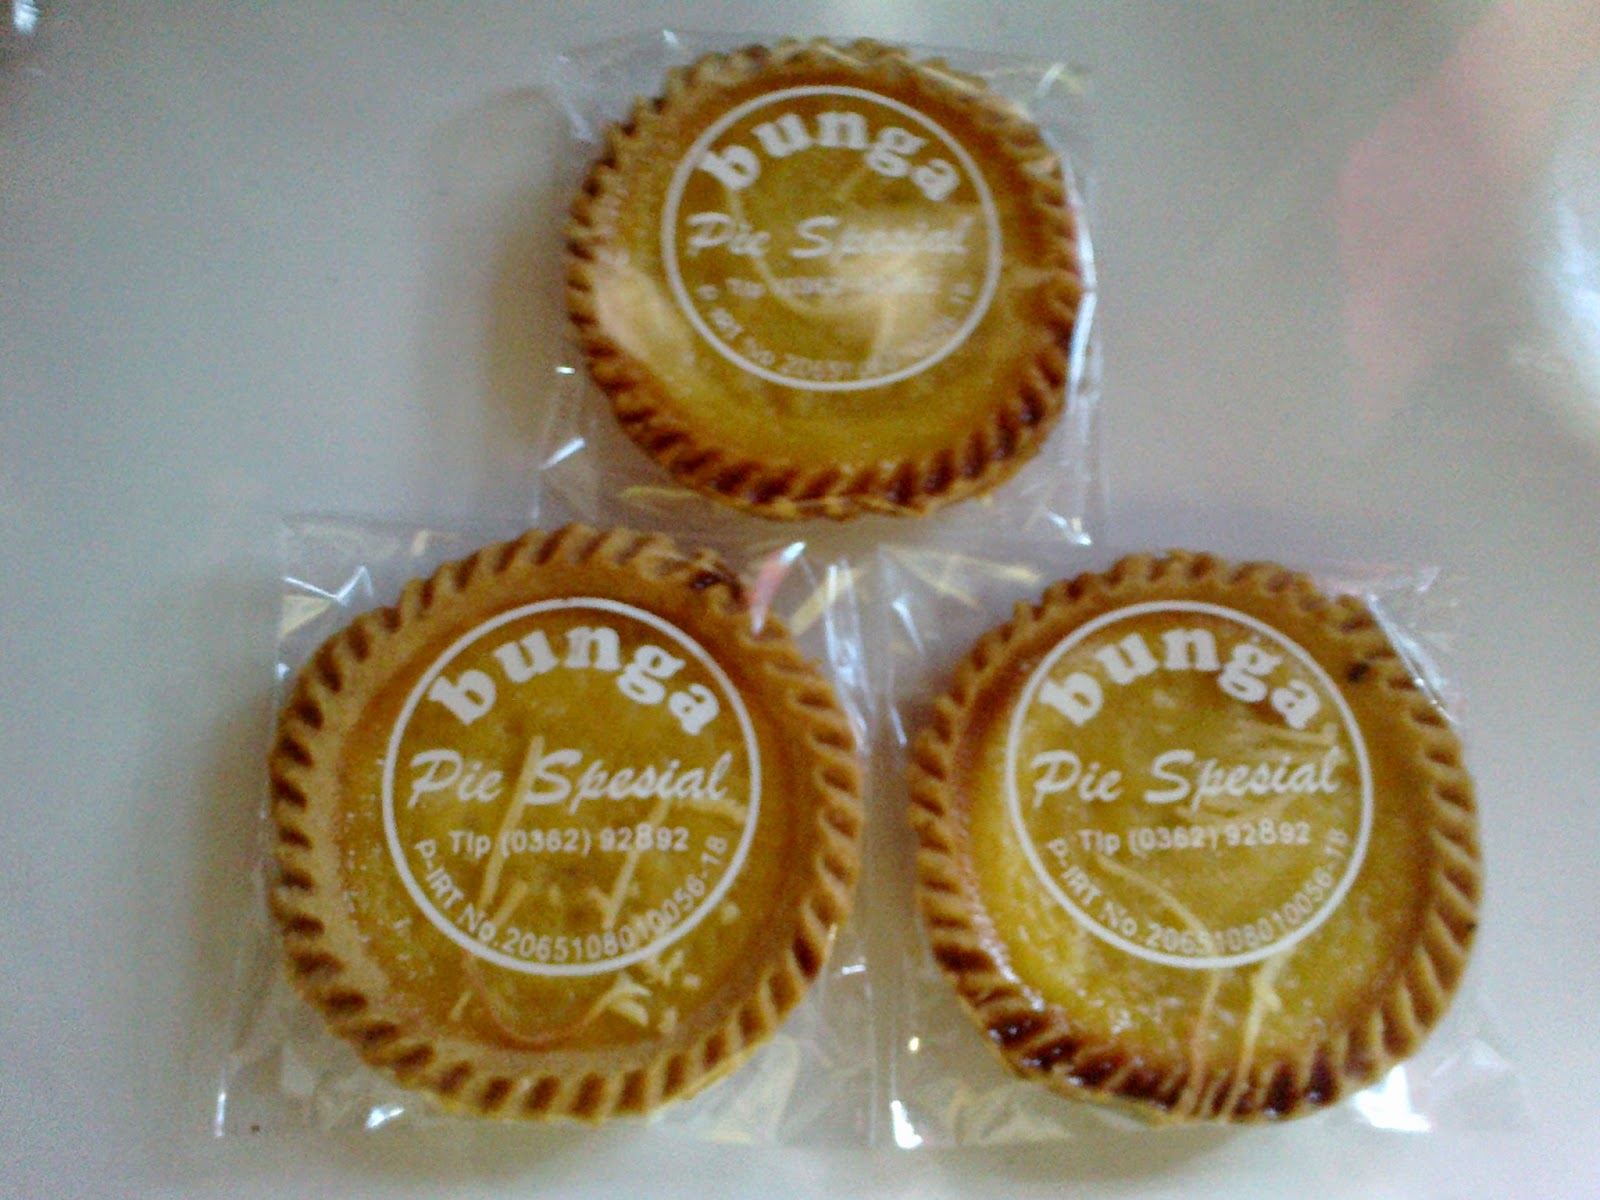 Jual Pie Susu Bali Mataram